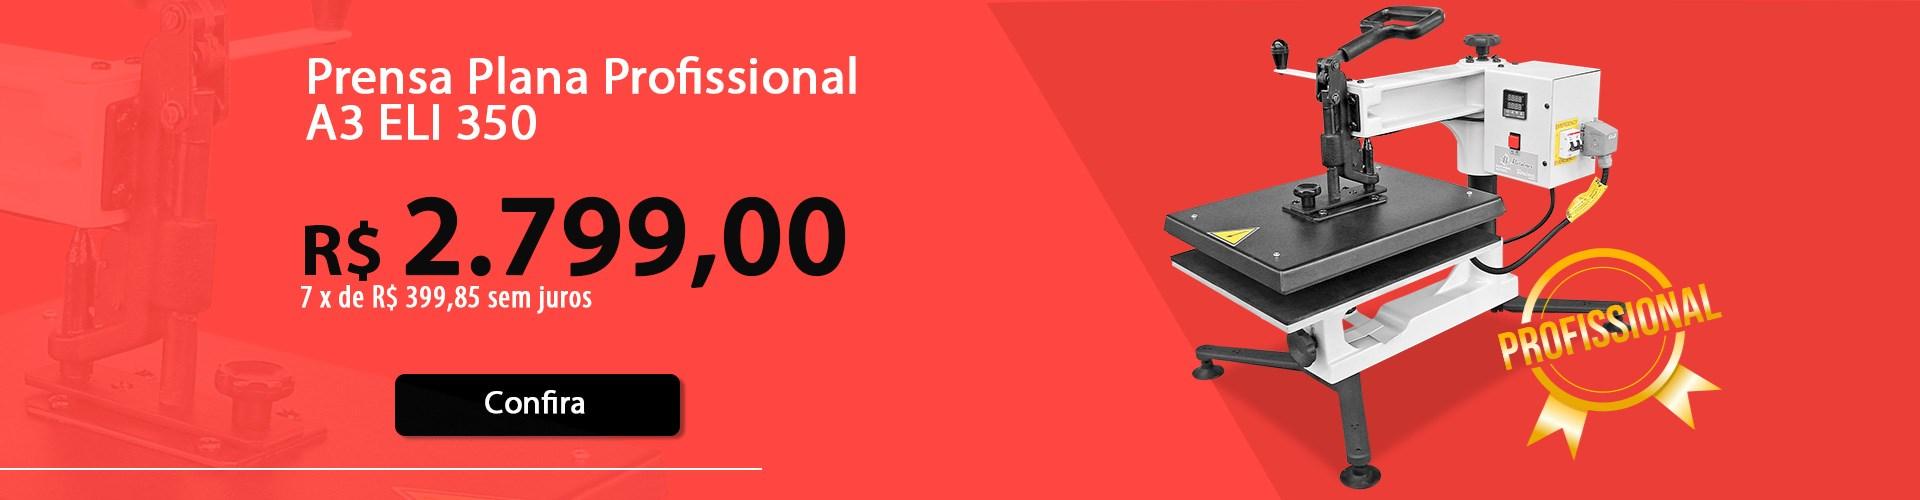 Prensa Profissional ELI 350 A3